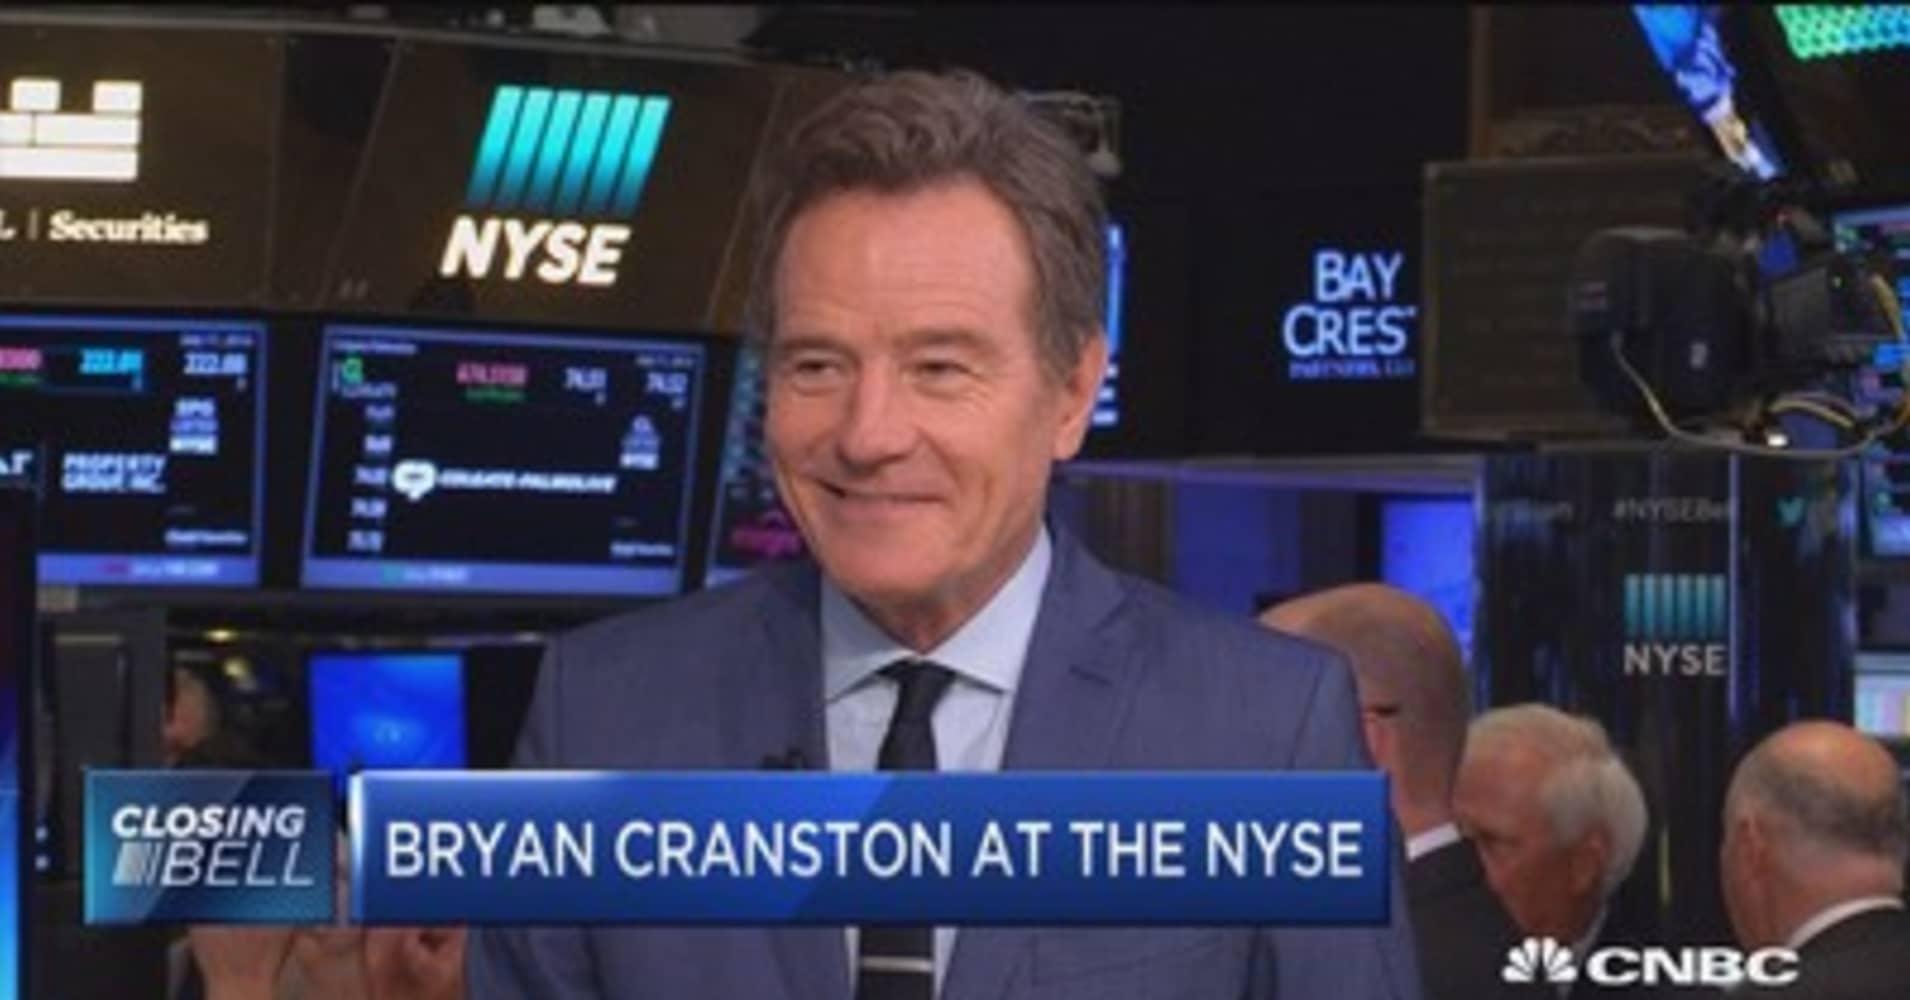 Breaking Bad 39 S Bryan Cranston This Is The Biggest Money